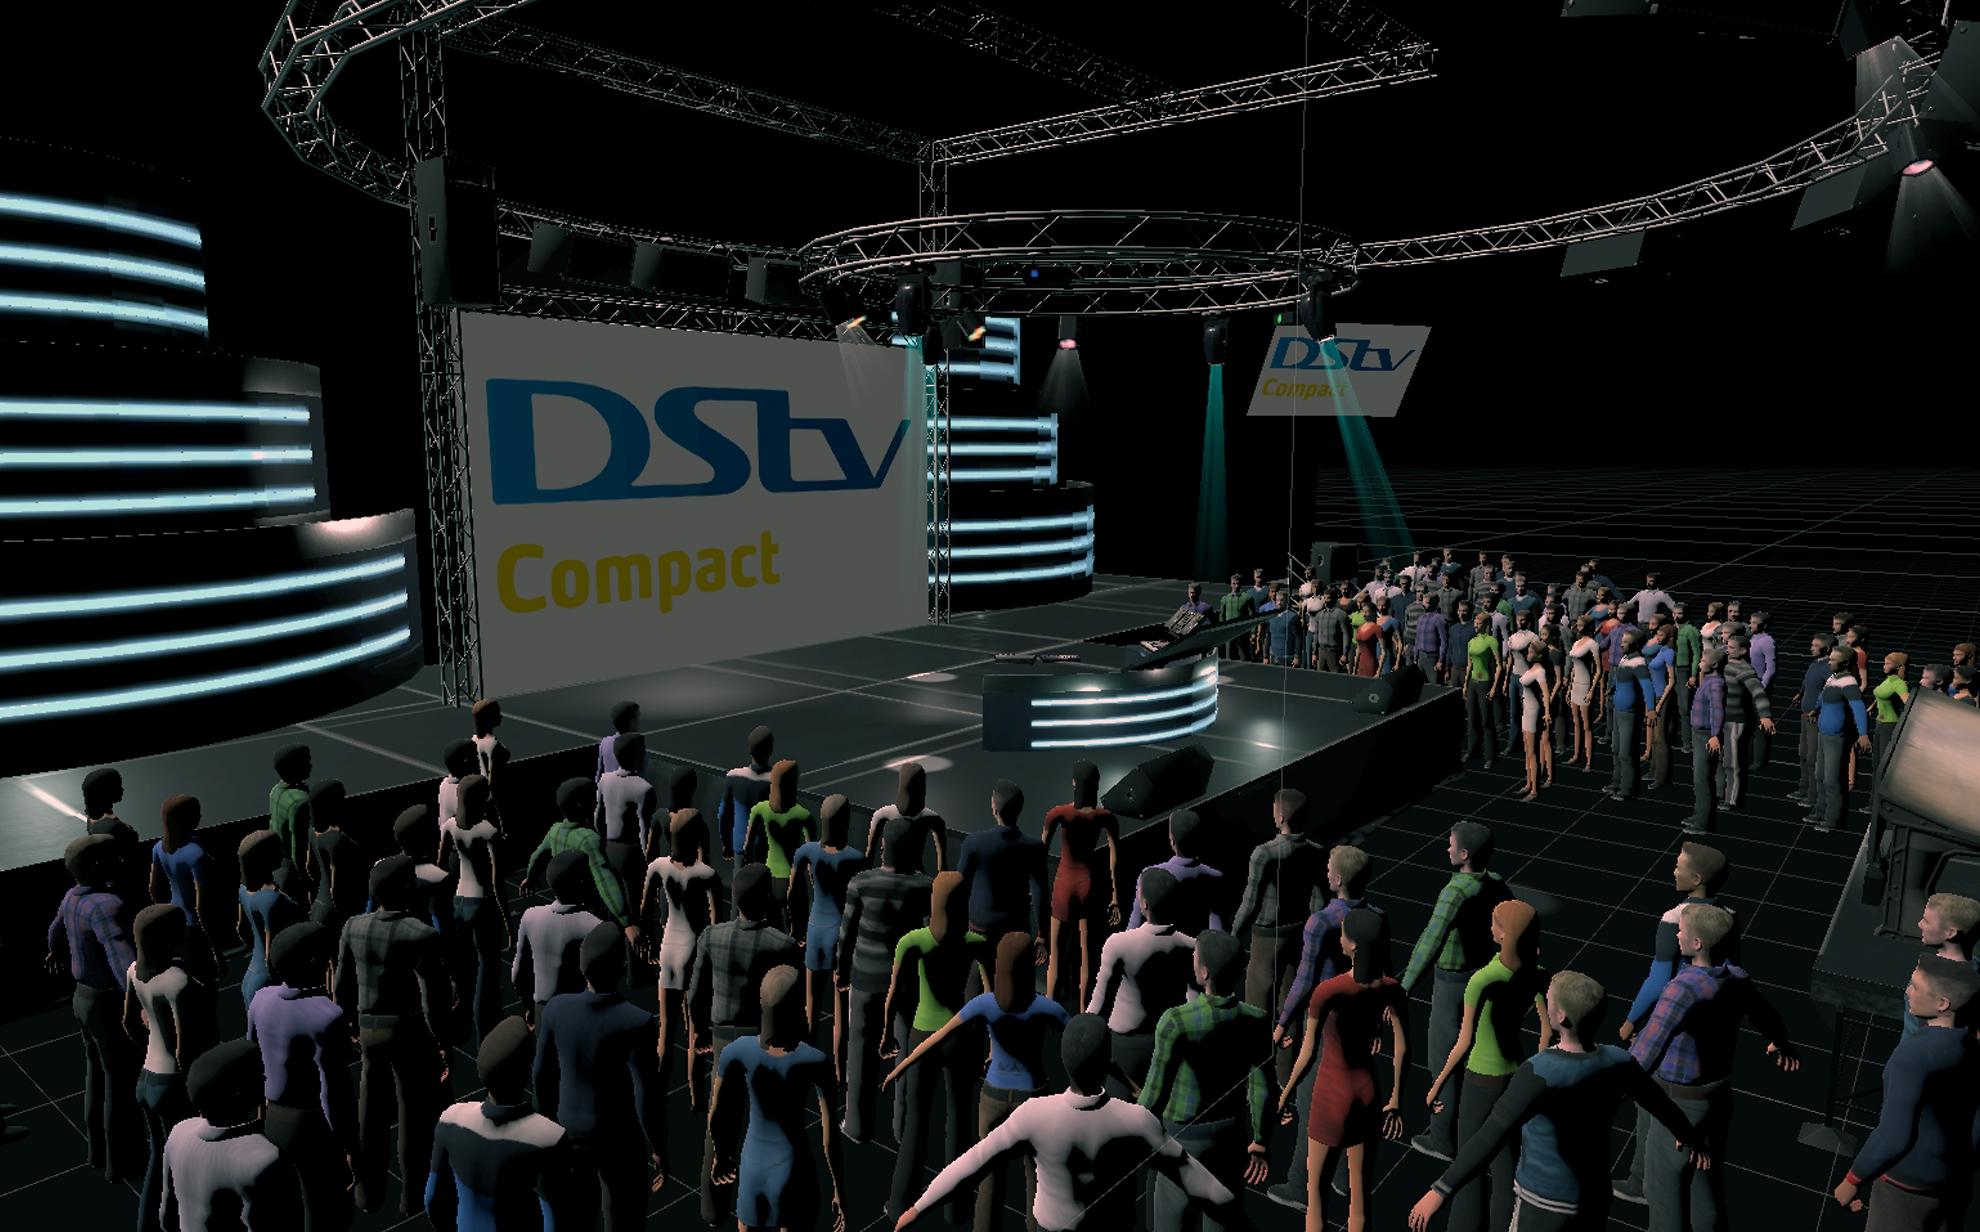 karaoke-virtual-reality-game